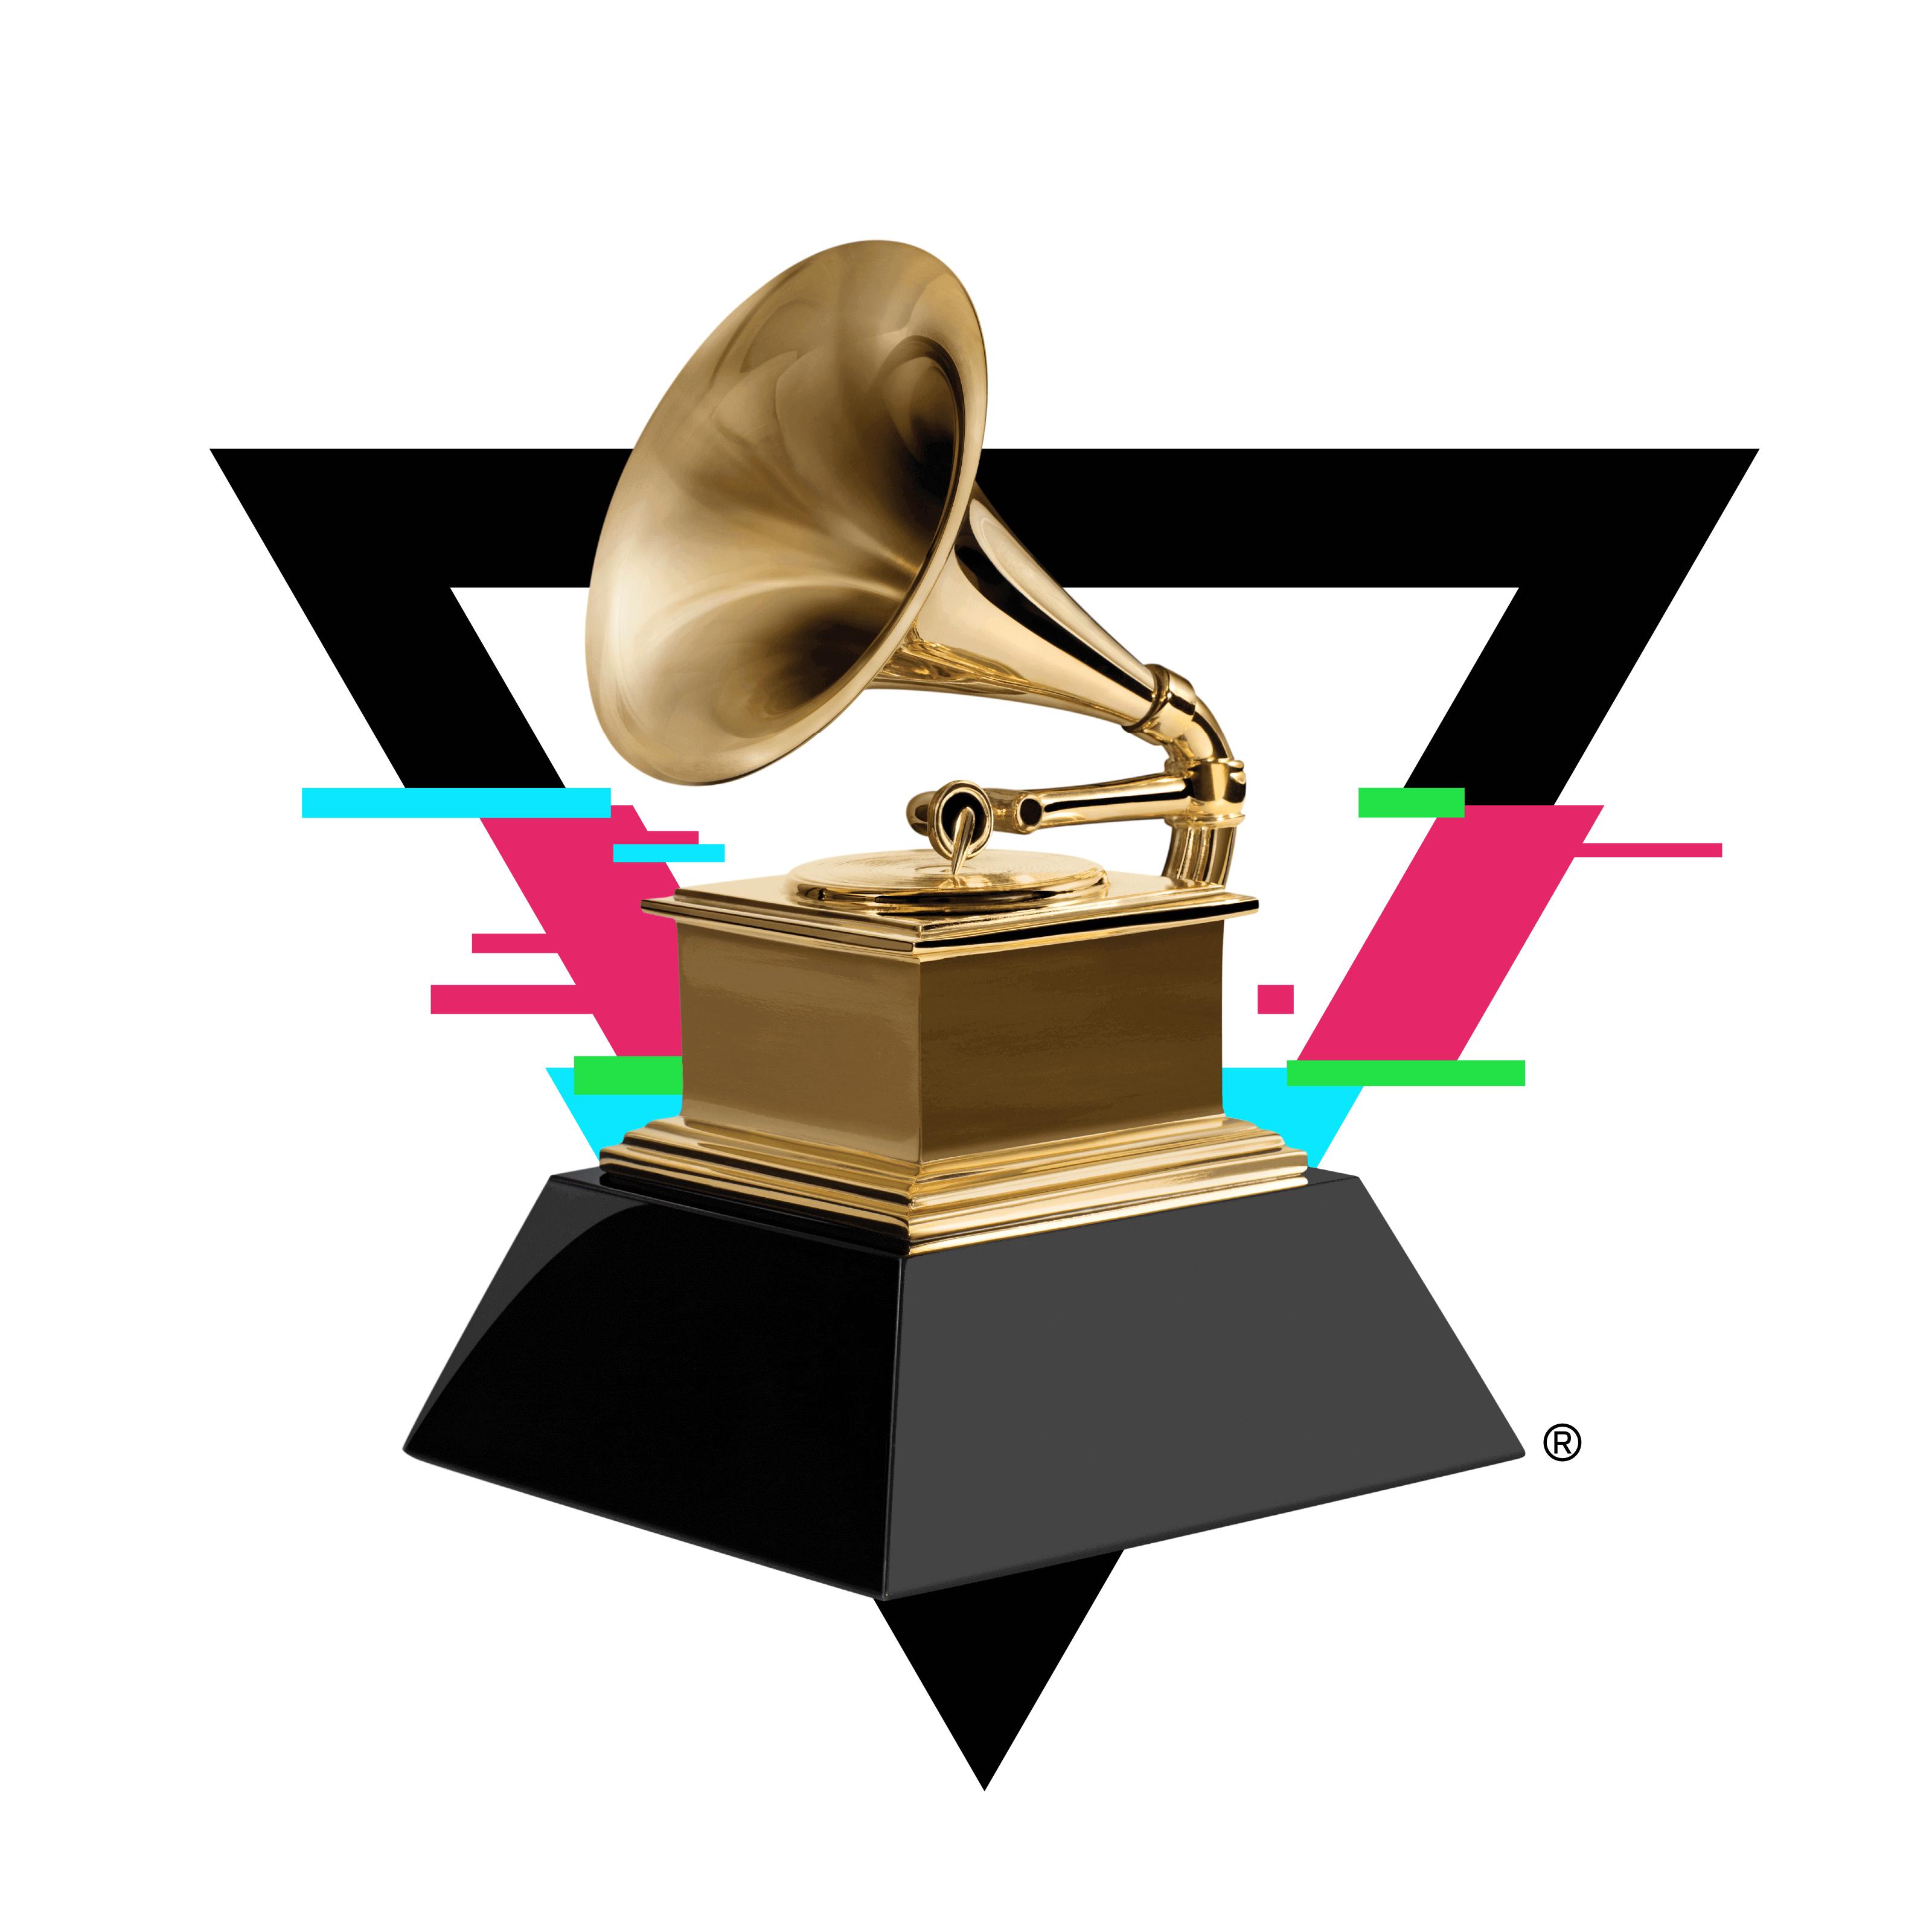 Pin By Point Debit Card Checking Acco On Grammys Grammy Grammy Awards R B